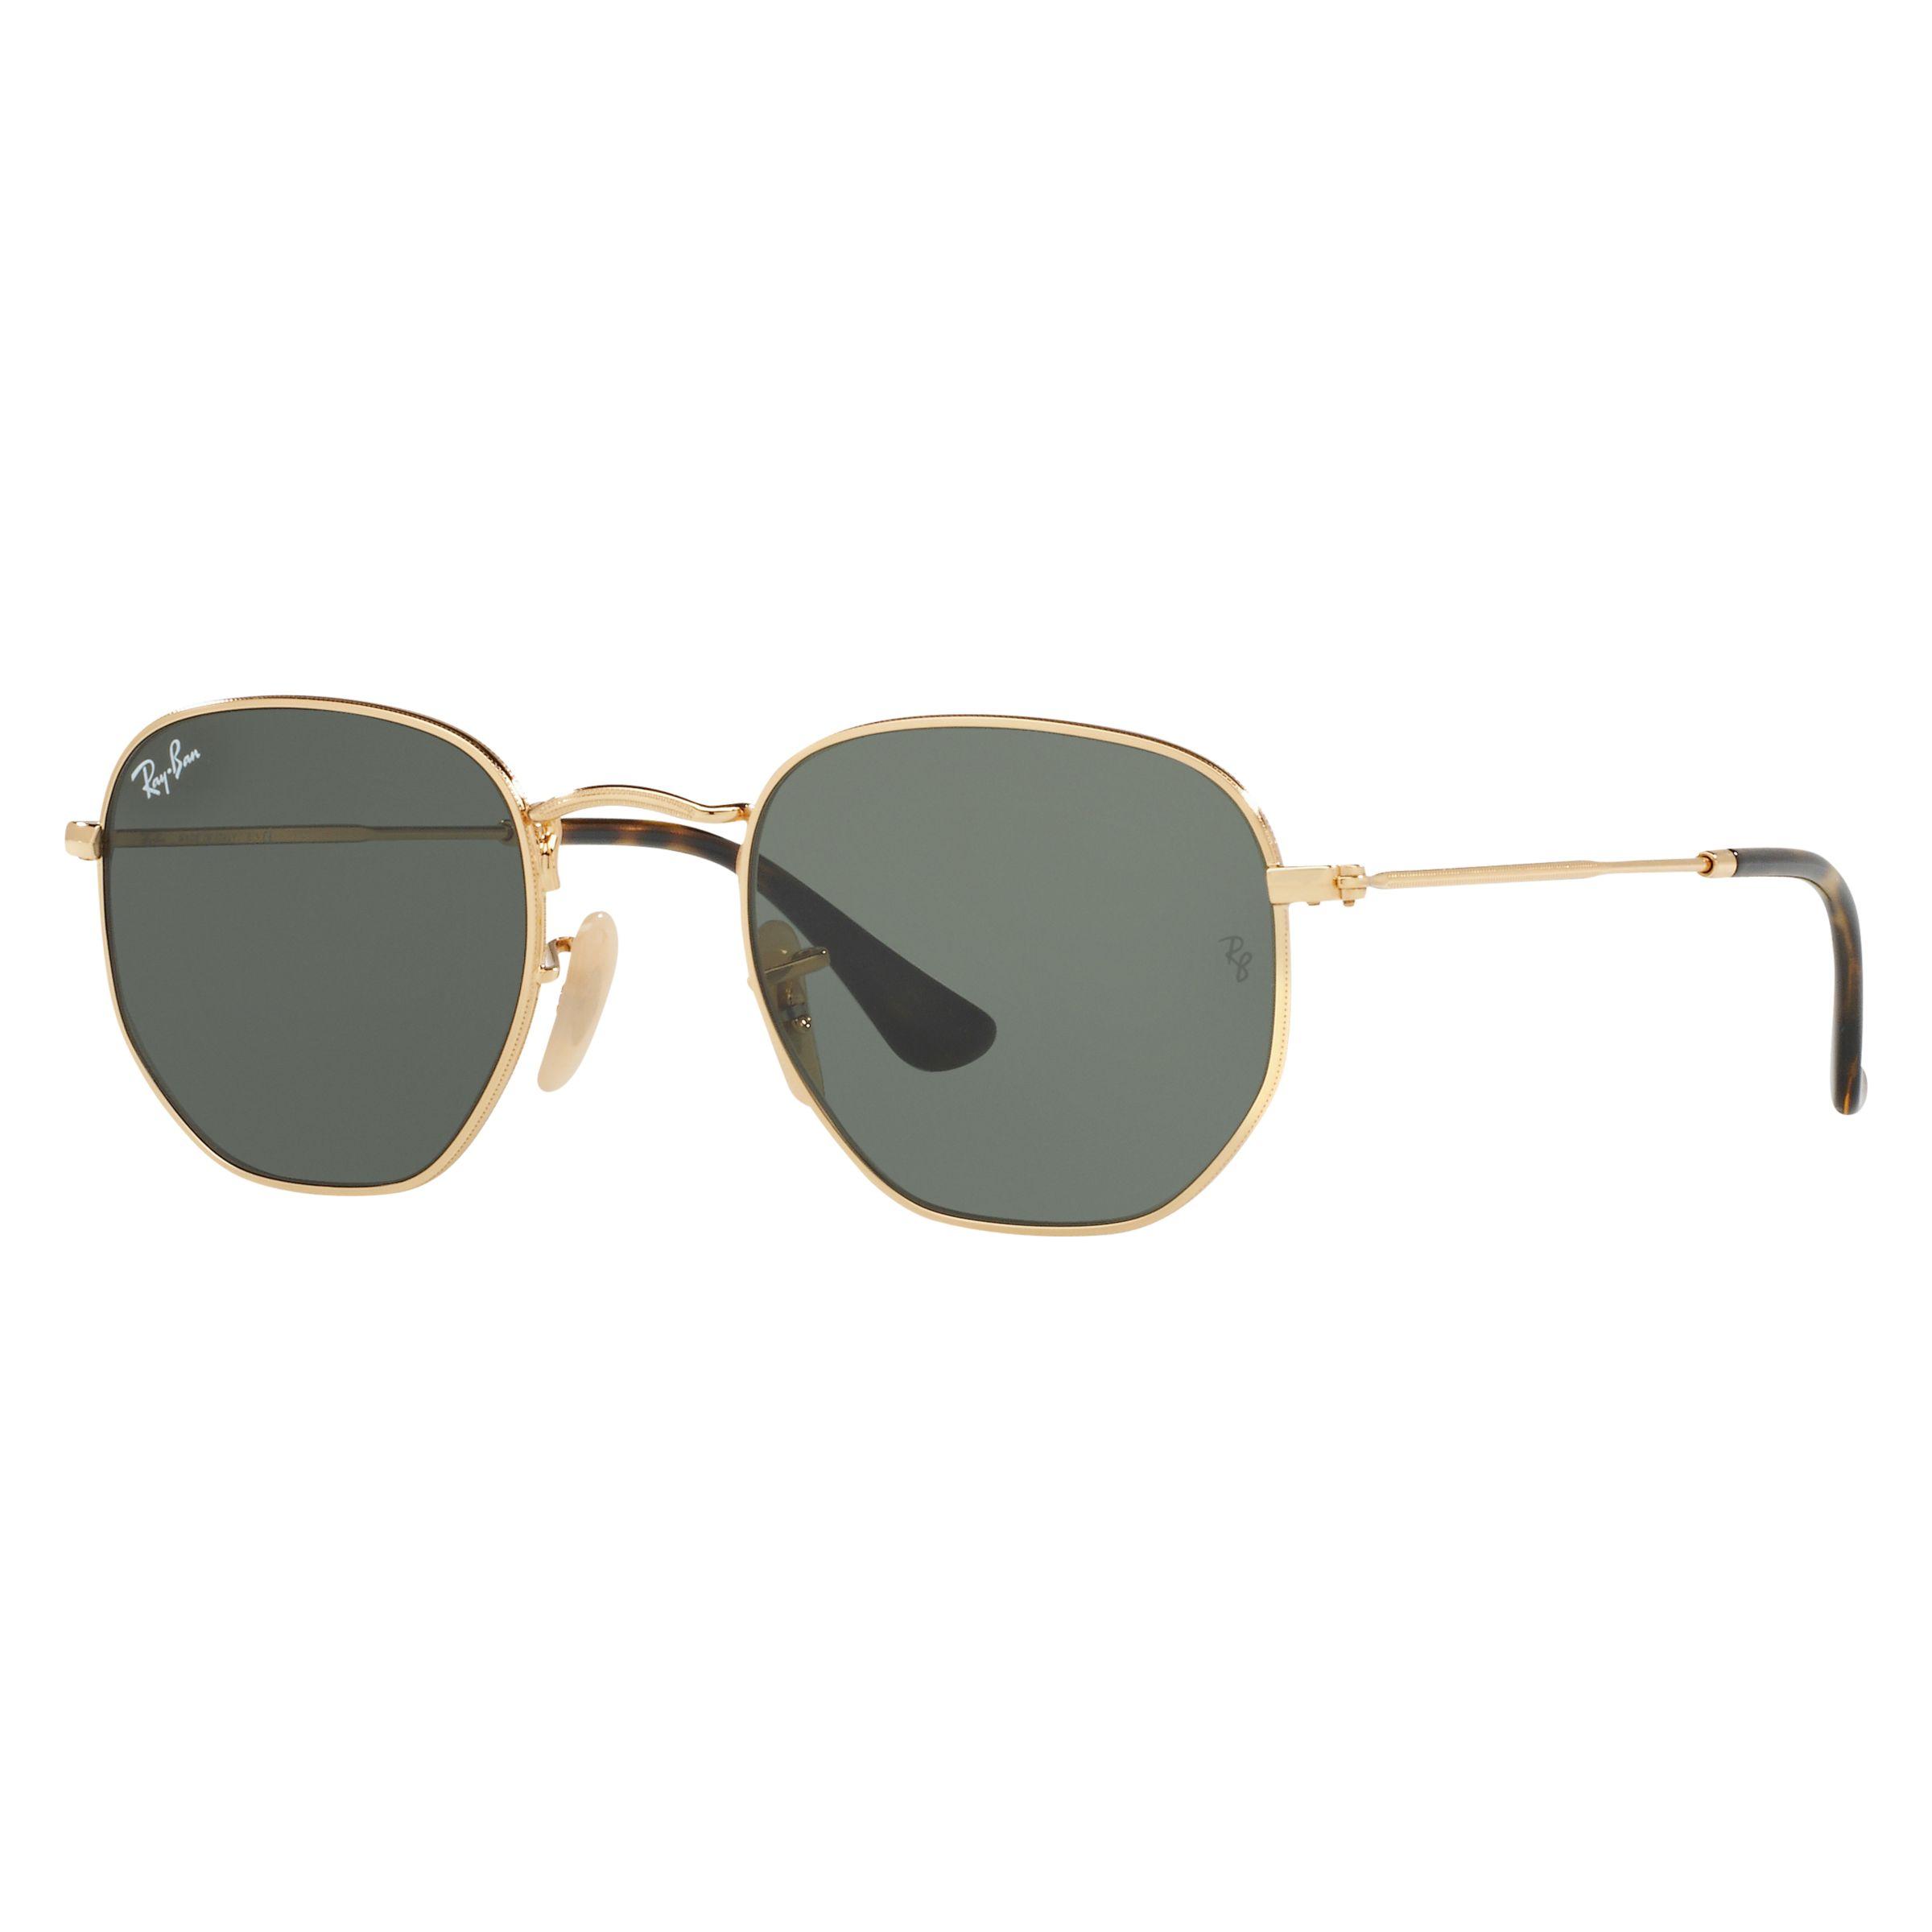 6a529d0ec57e Ray-Ban RB3548 Hexagonal Flat Lens Sunglasses at John Lewis   Partners